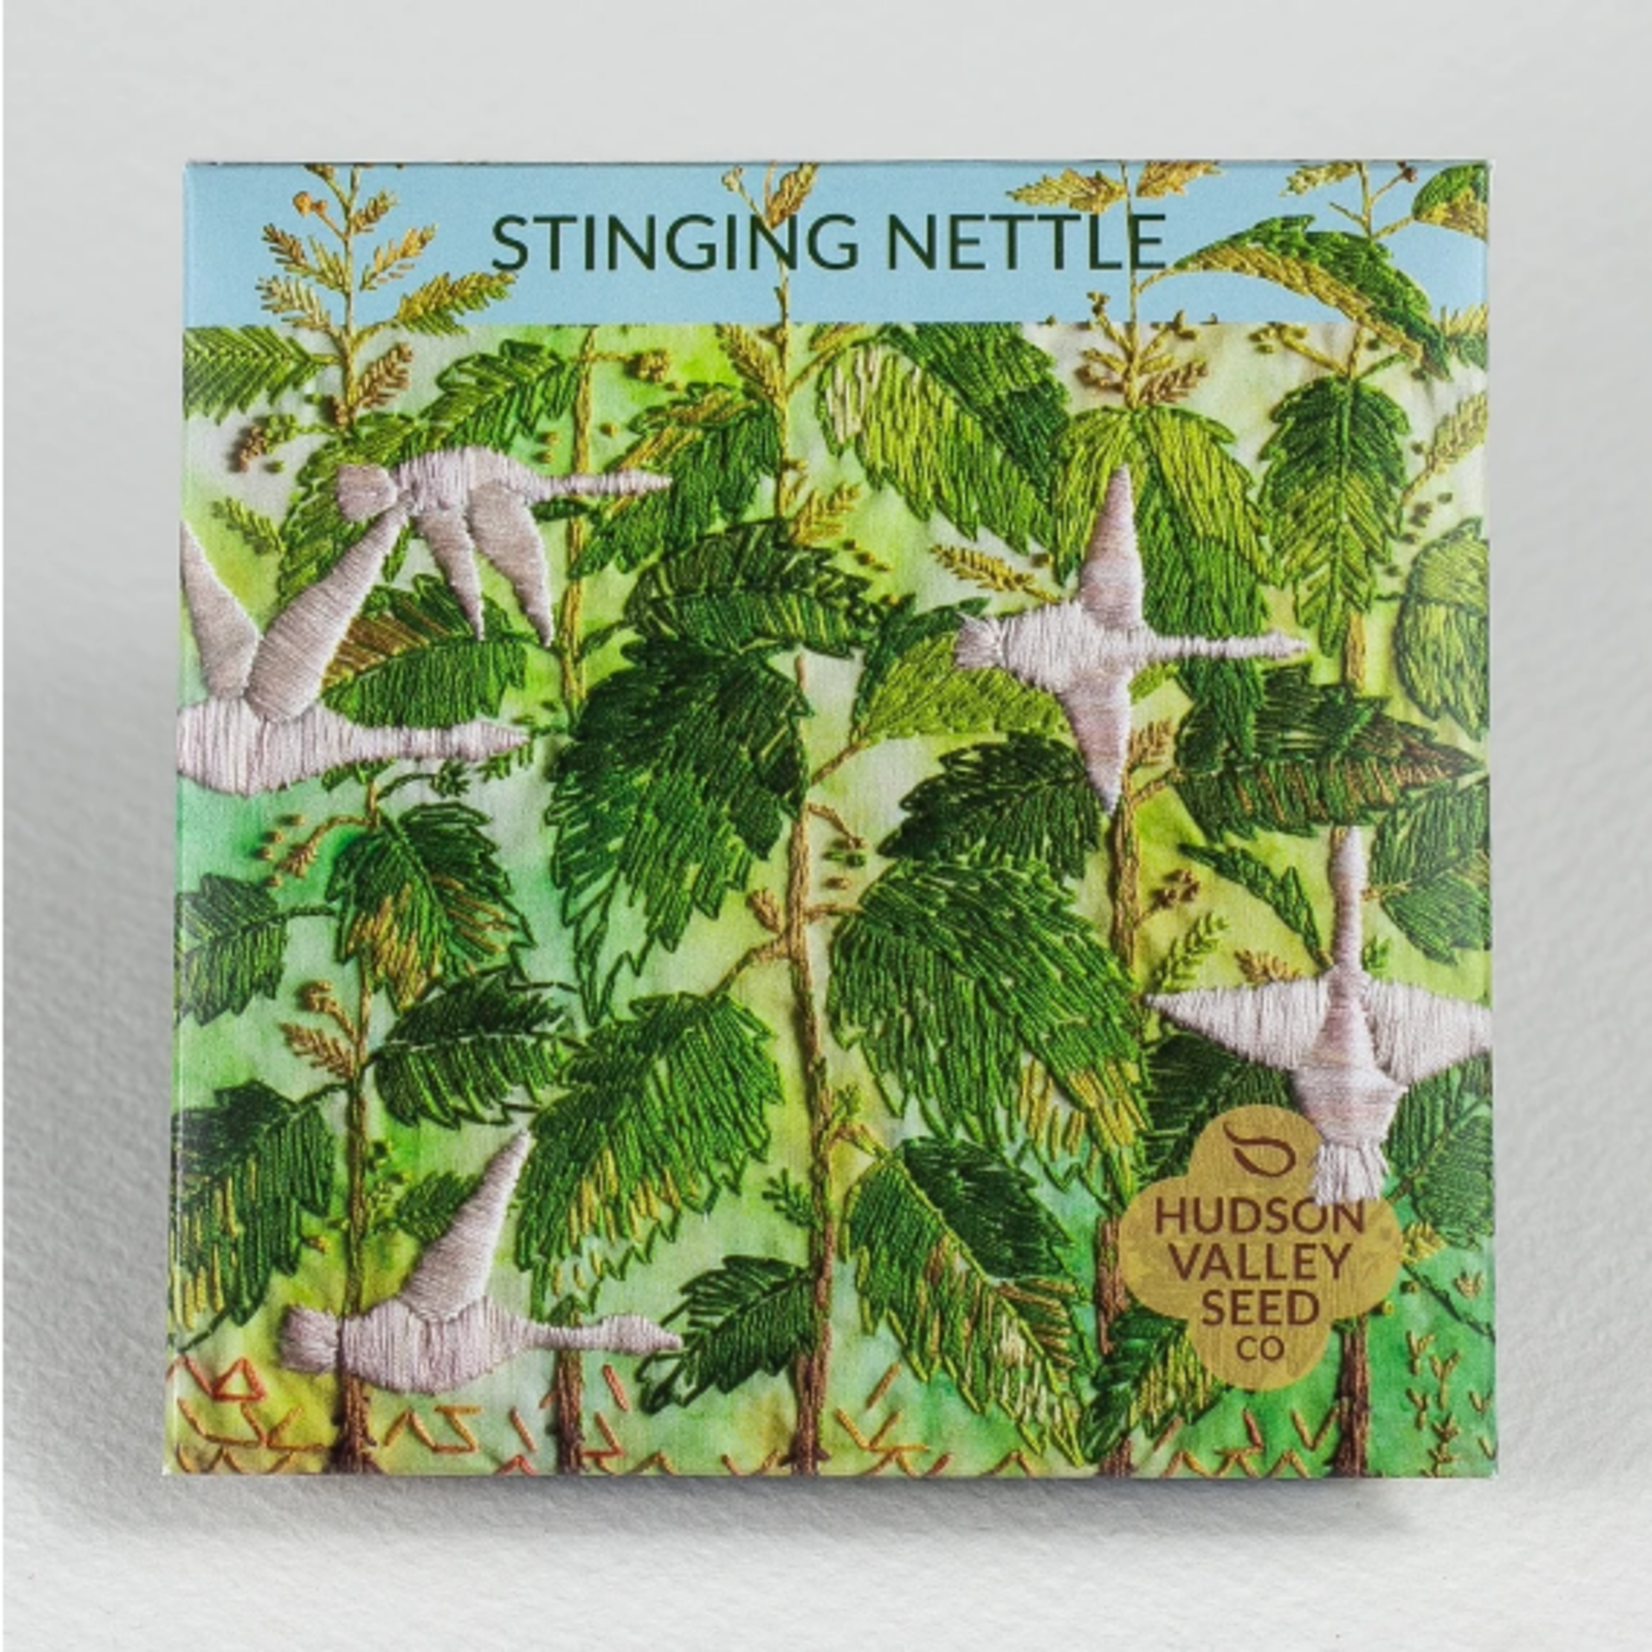 Hudson Valley Seeds Stinging Nettle Seeds